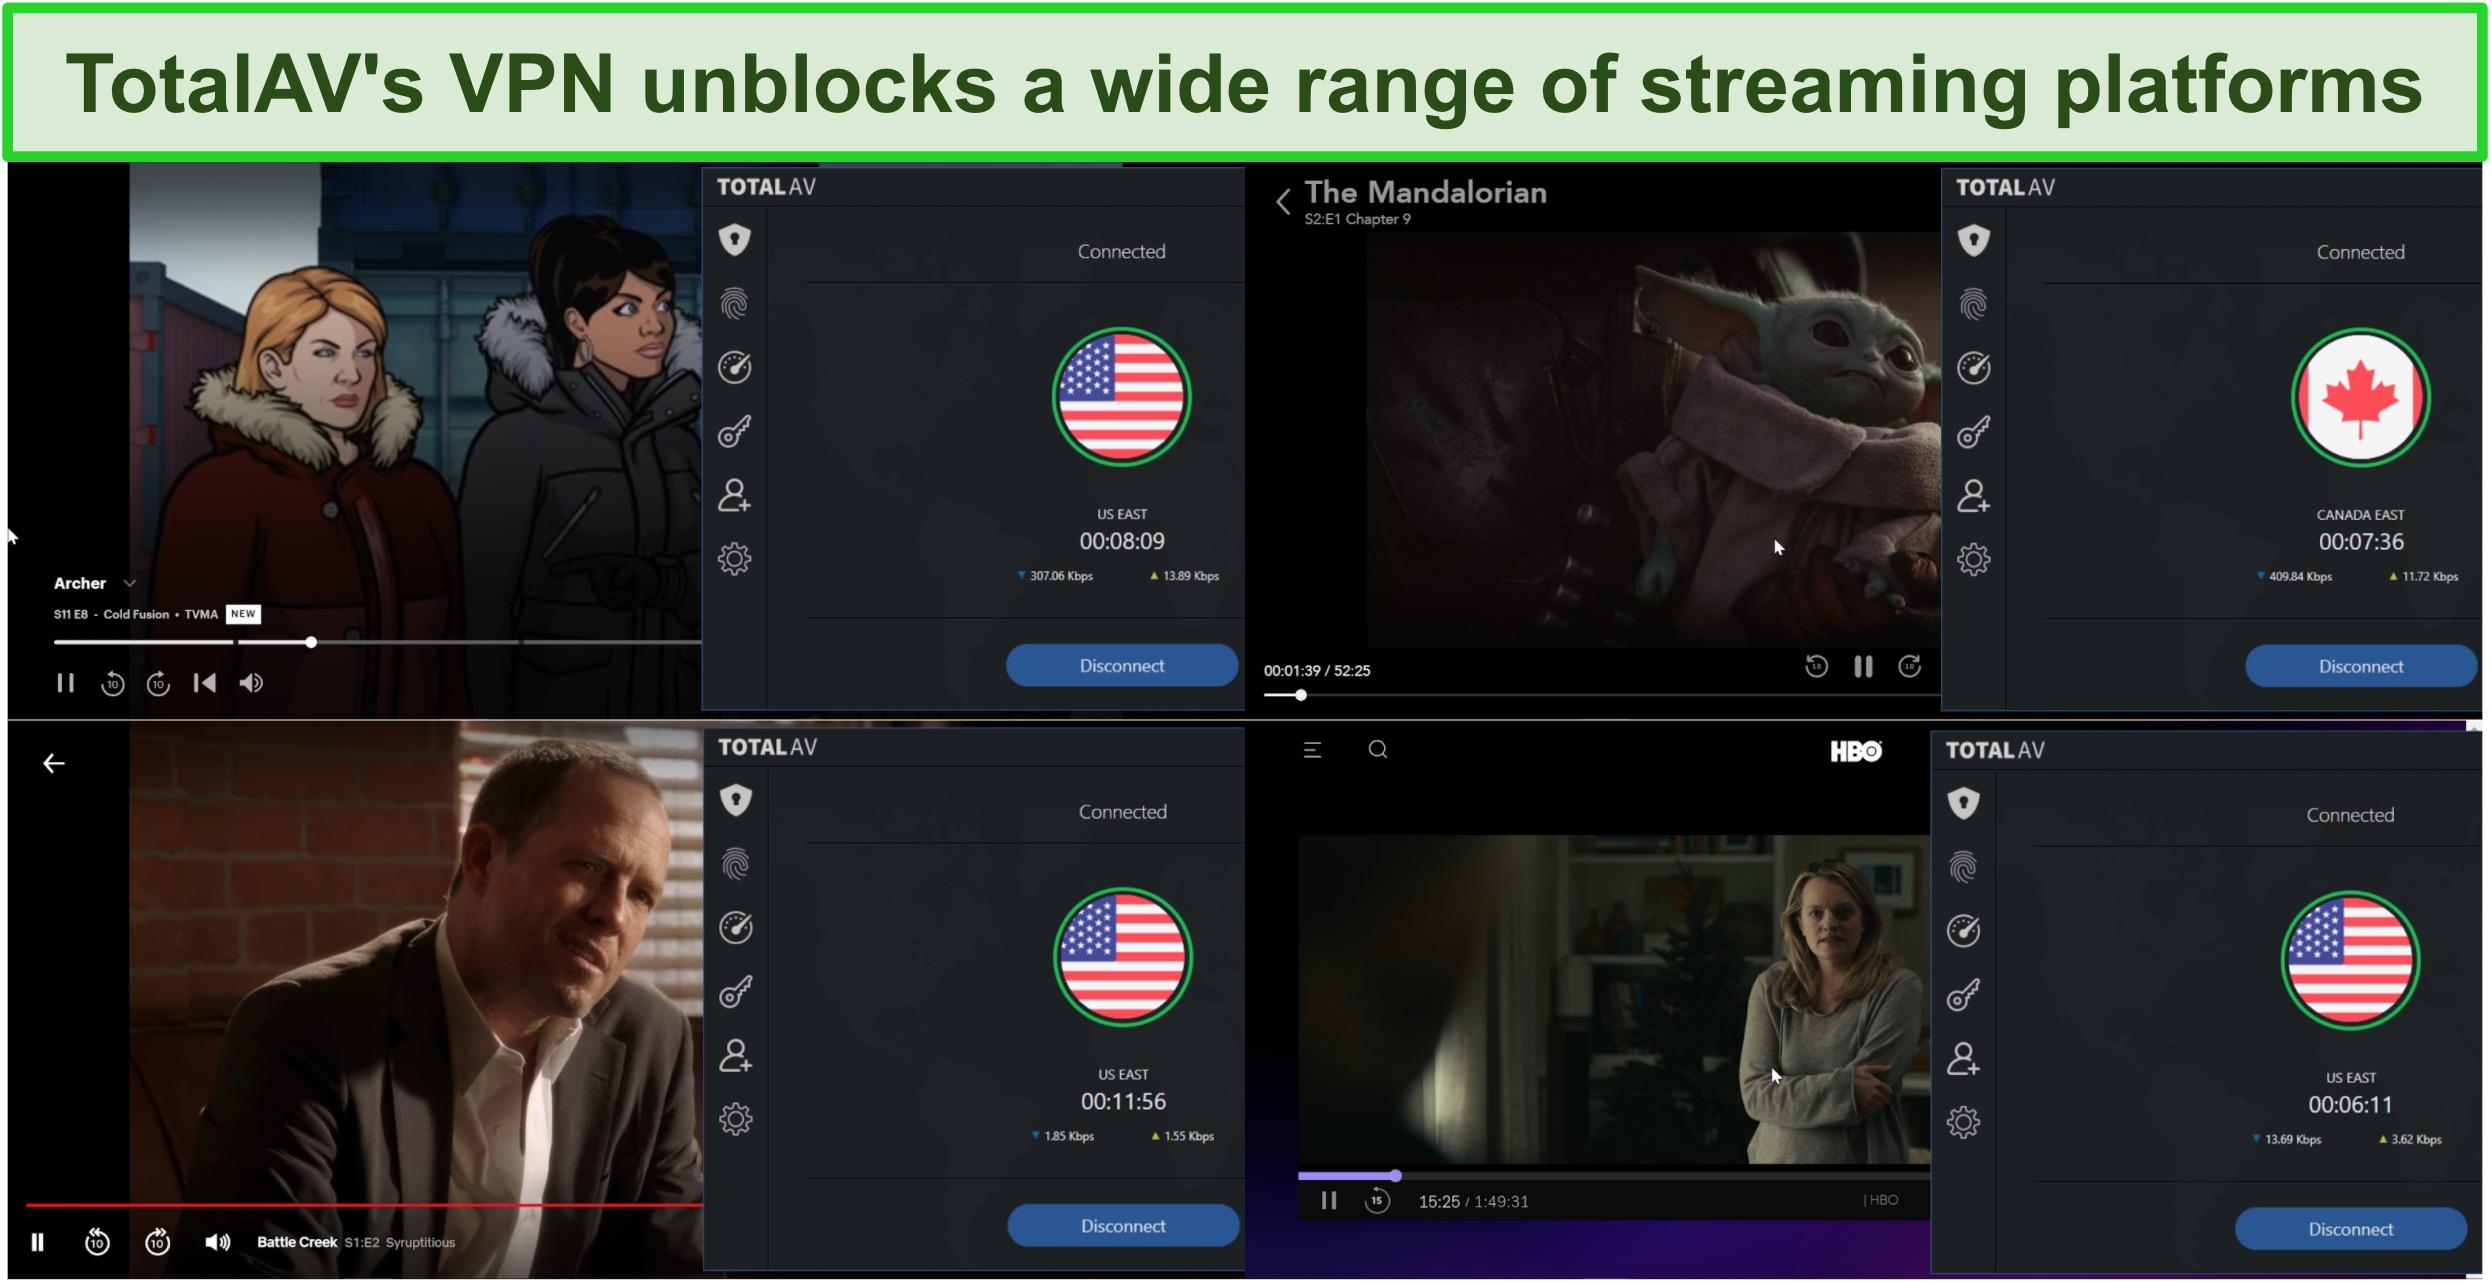 Screenshot of TotalAV's VPN unblocking Hulu, Disney+, Netflix, and HBO Max.